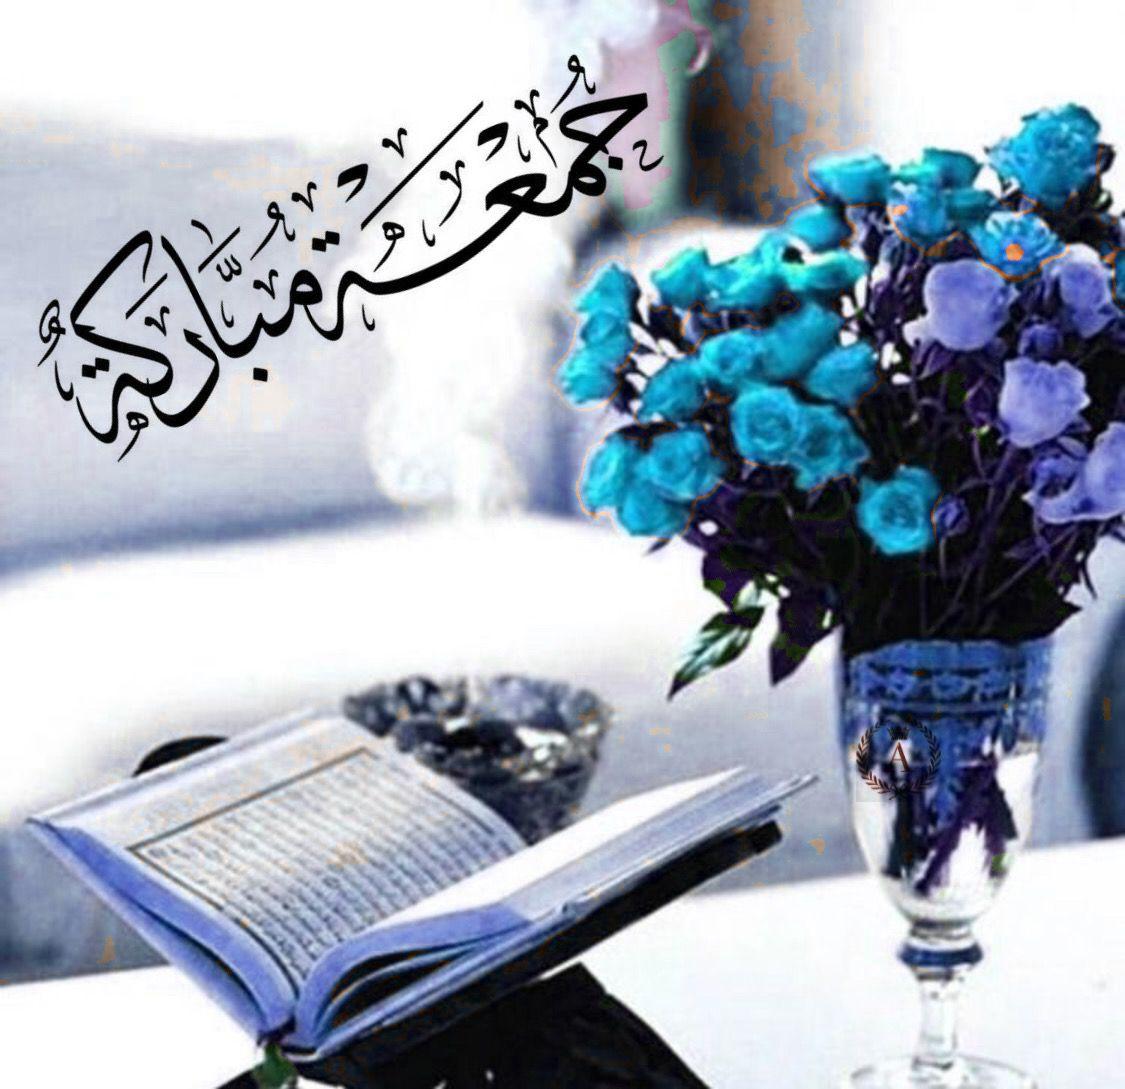 جمعة مباركة Juma Mubarak Jumah Mubarak Jumma Mubarak